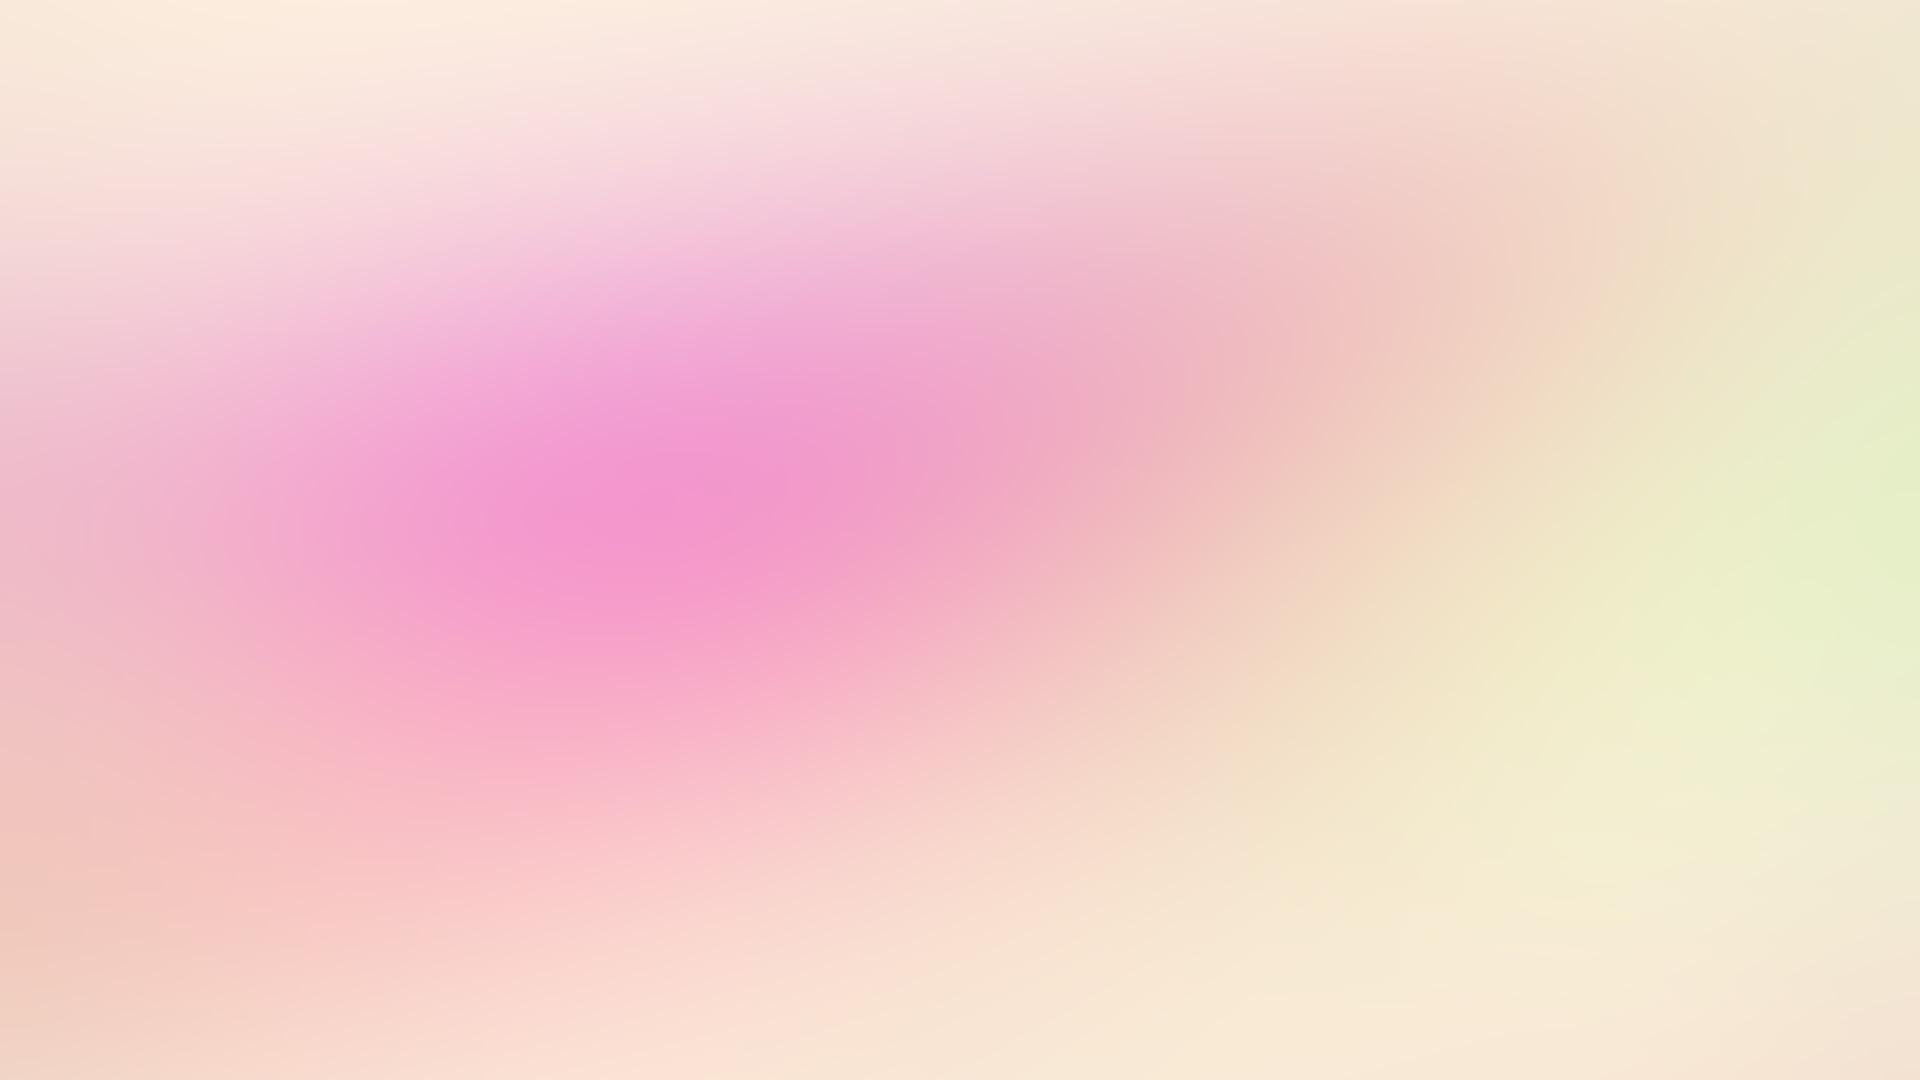 Cute Pink Apple Wallpapers Si51 Soft Pastel Red Gradation Blur Wallpaper